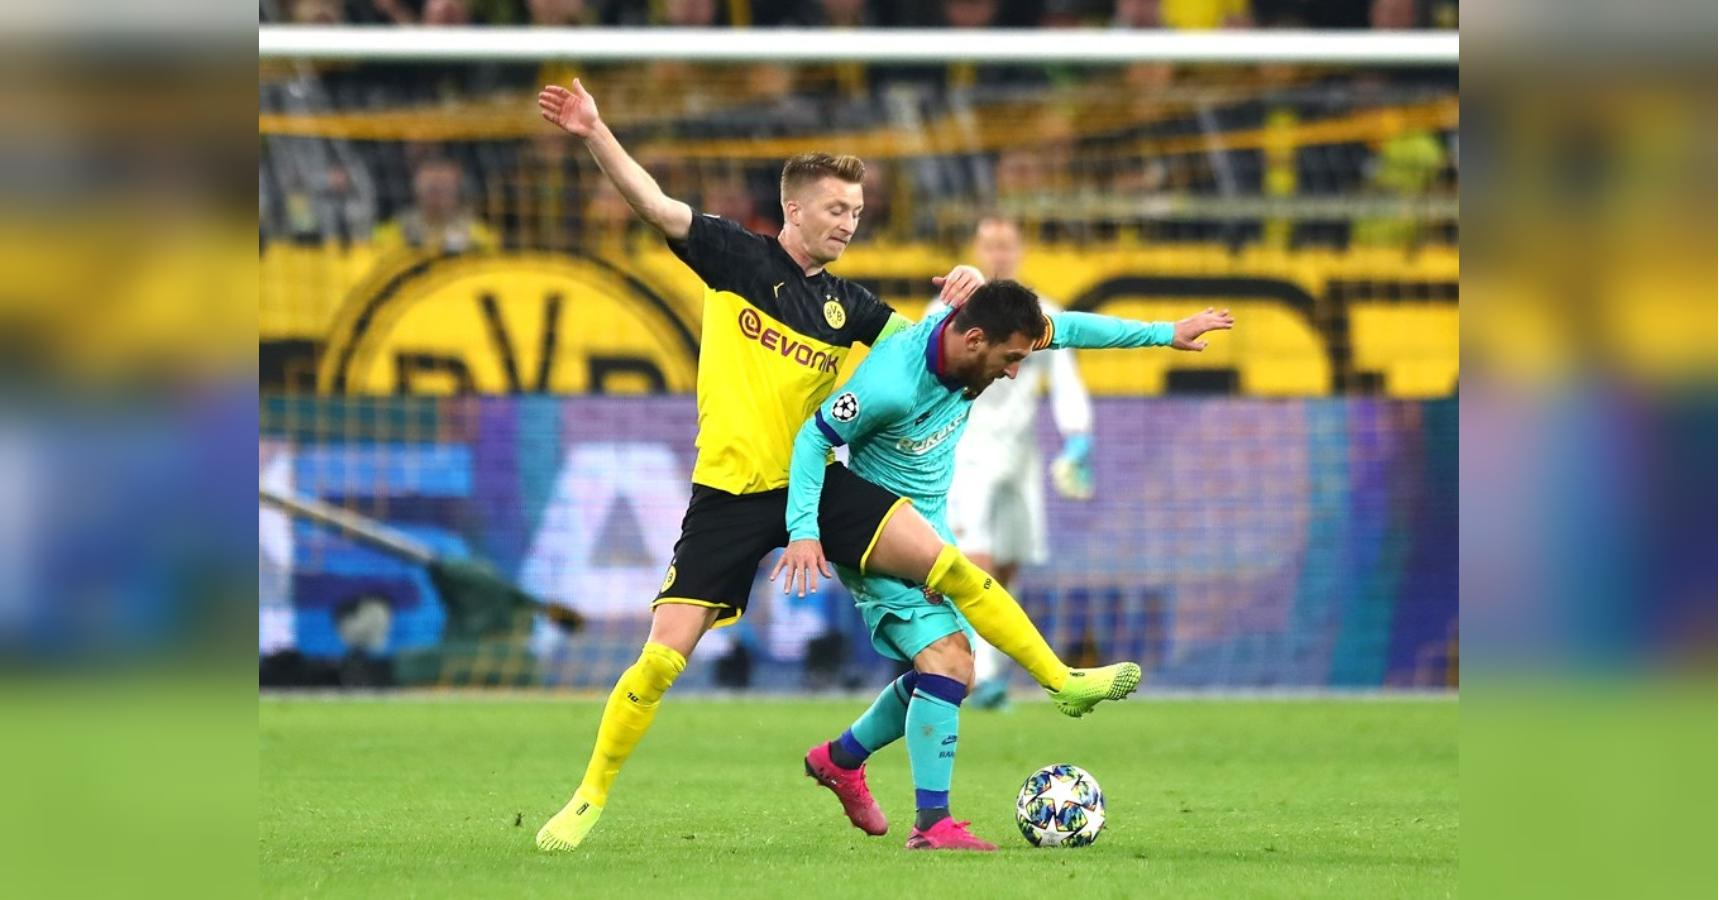 Смотреть онлайн футбол лч зенит боруссия